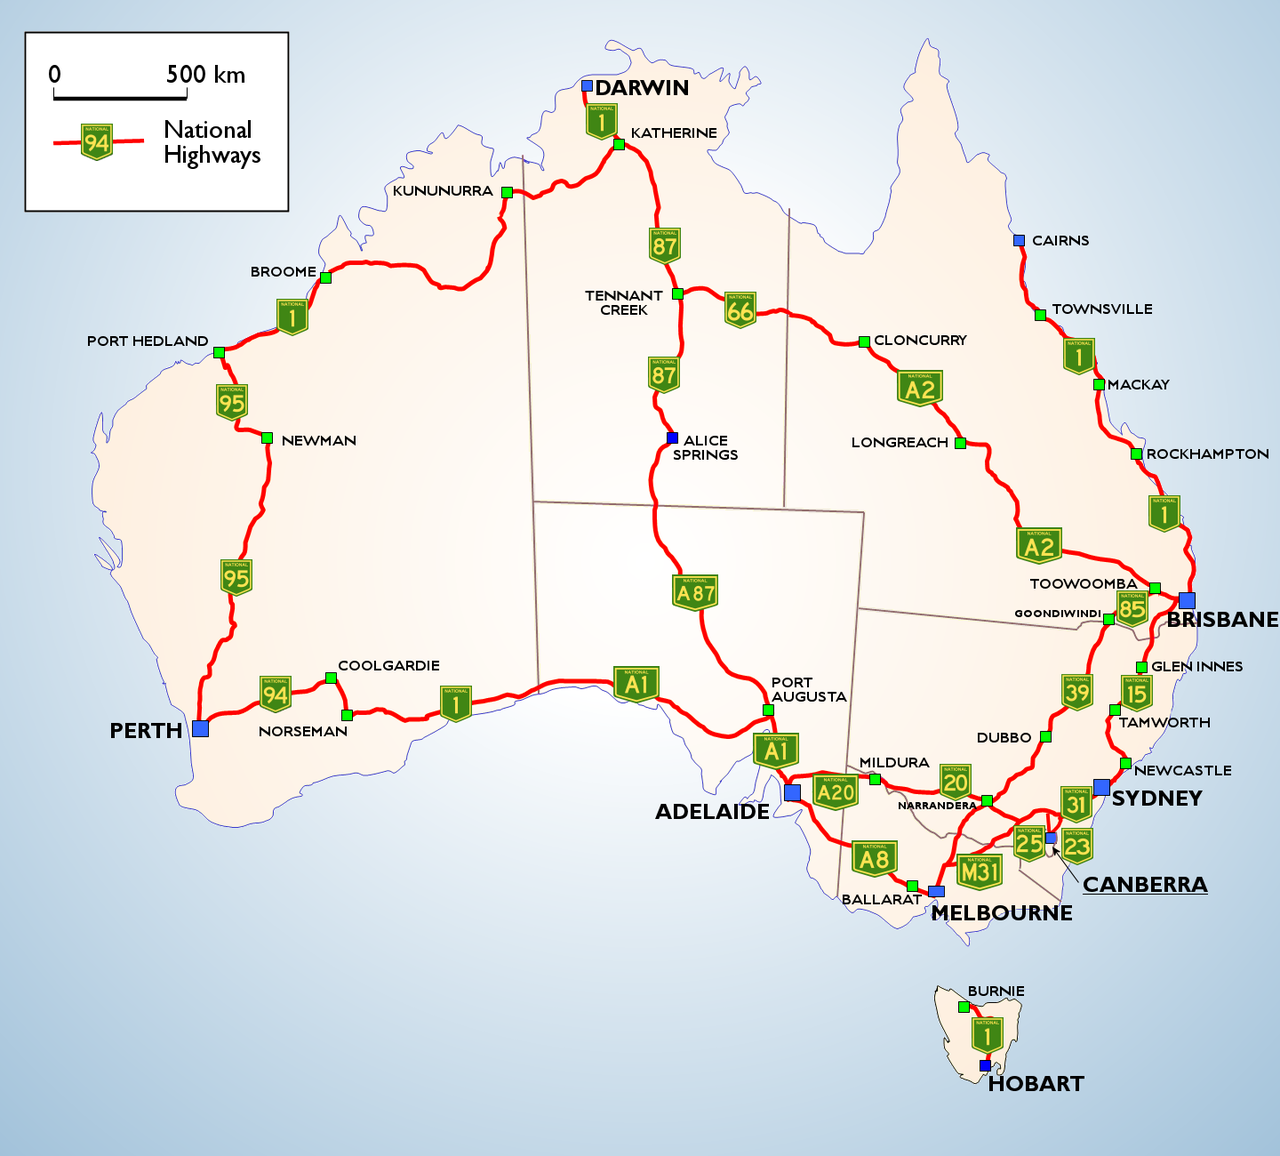 Map Of Australia Highways.National Highway Of Australia Favorite Places Spaces Australia